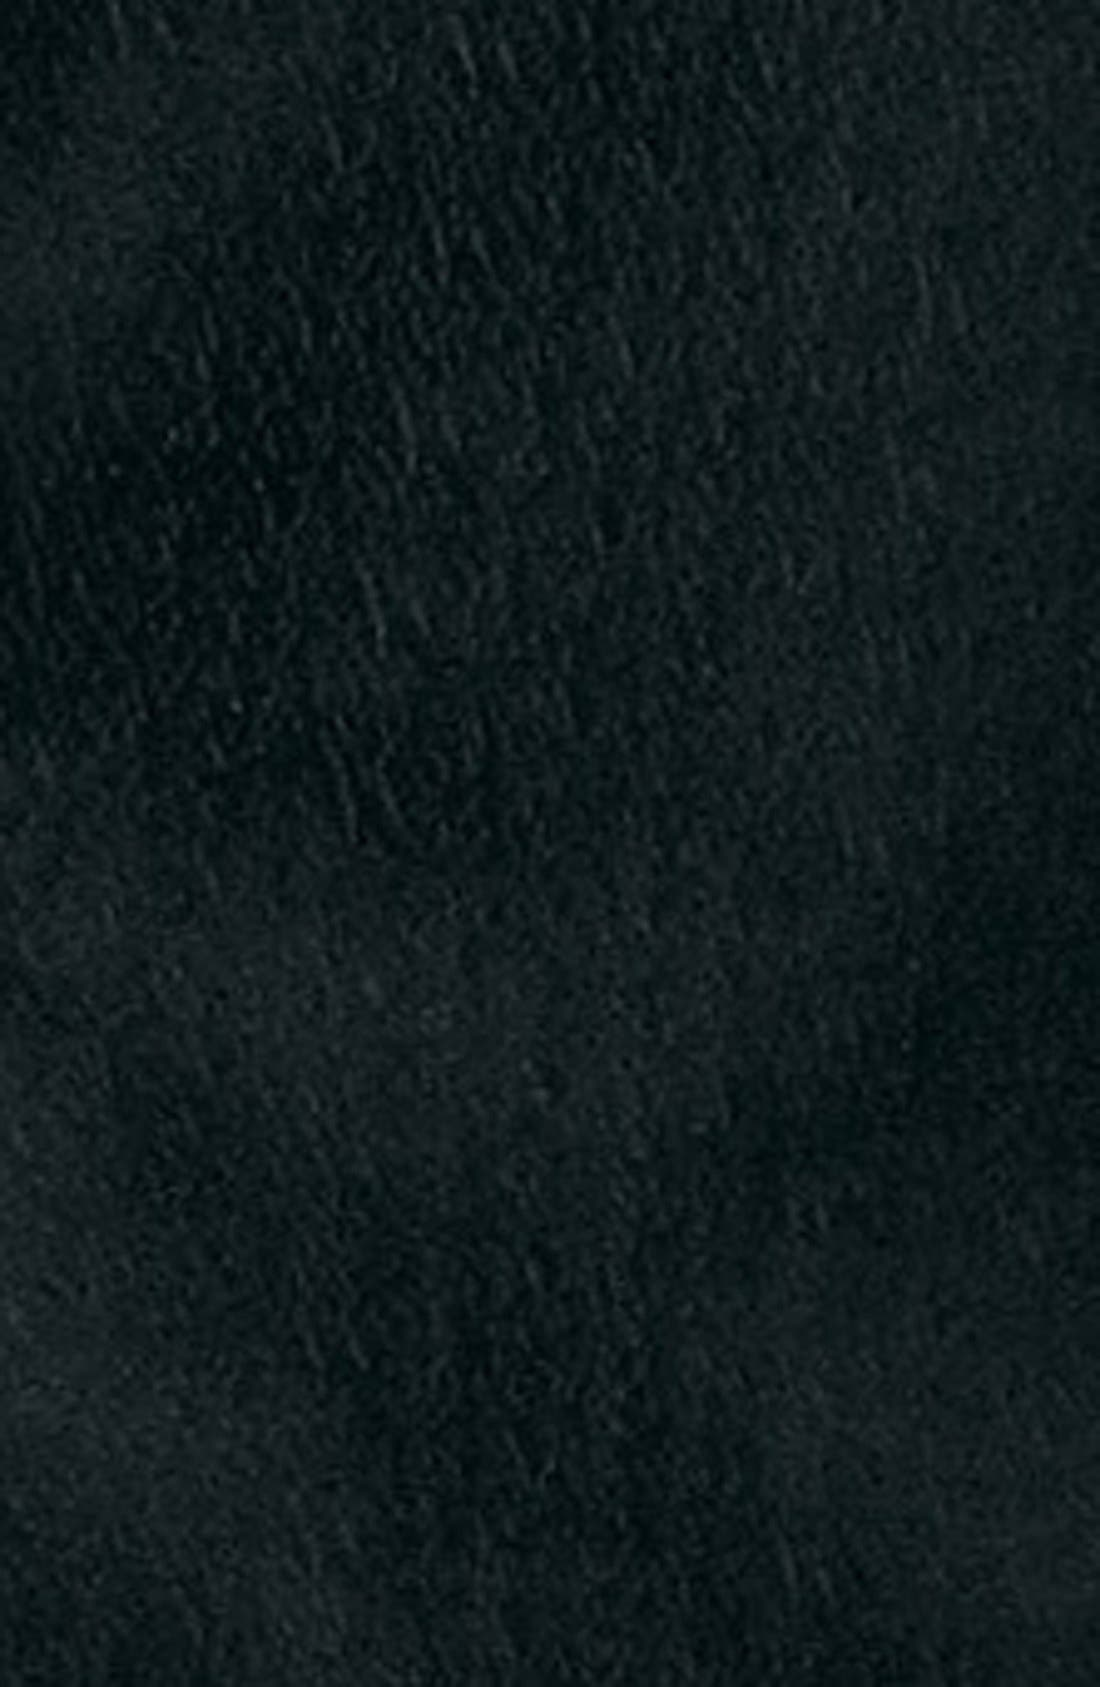 TOPMAN, Black Textured Skinny Fit Tuxedo Jacket, Alternate thumbnail 4, color, 001